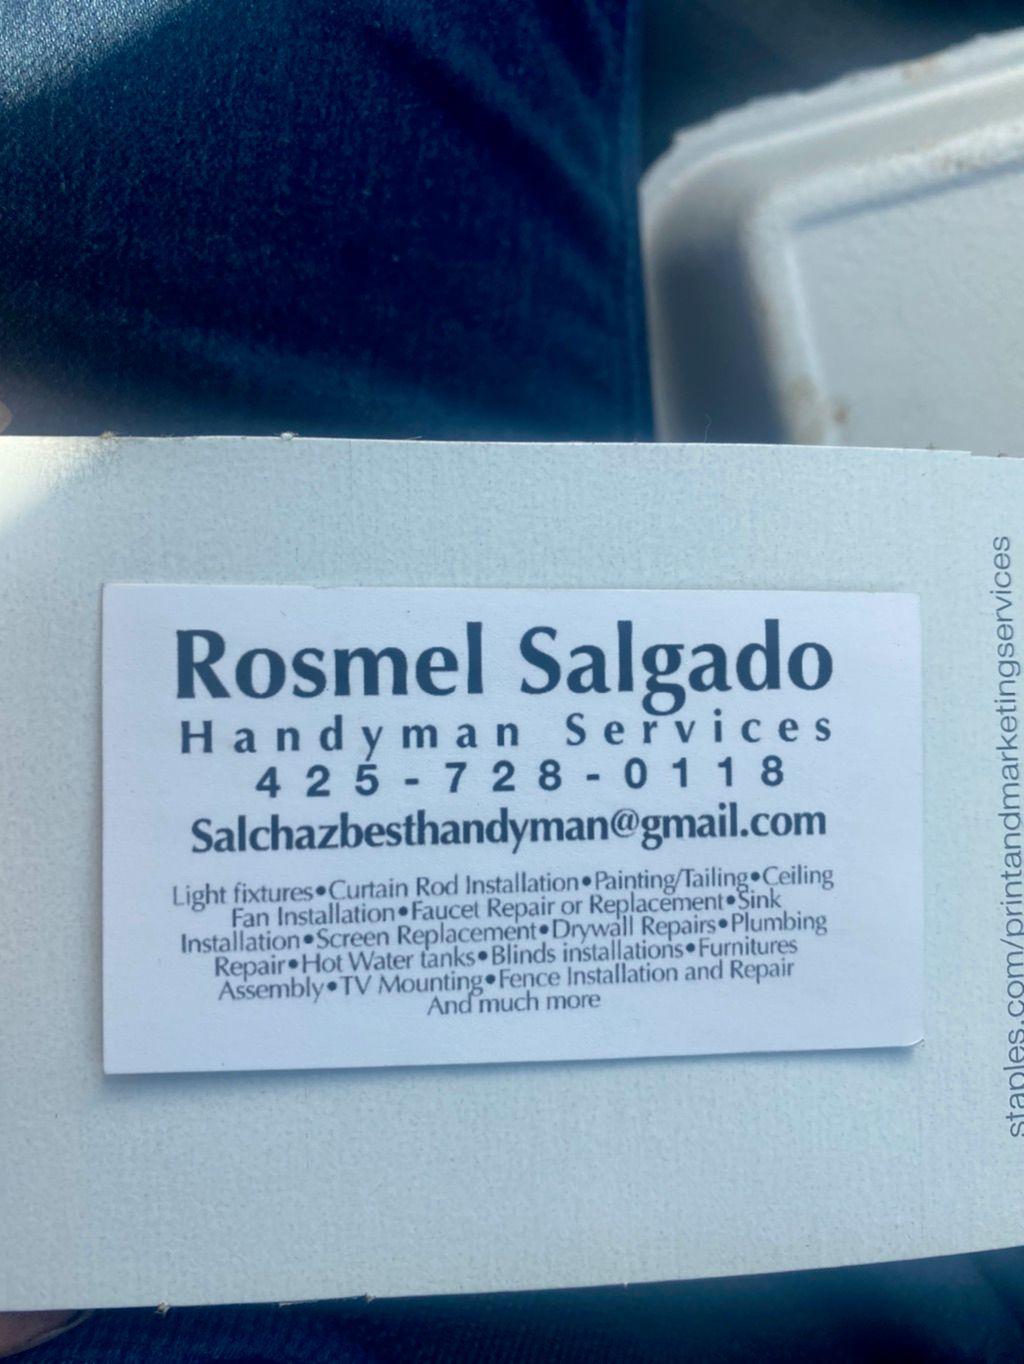 SalChaz Best Handyman LLC